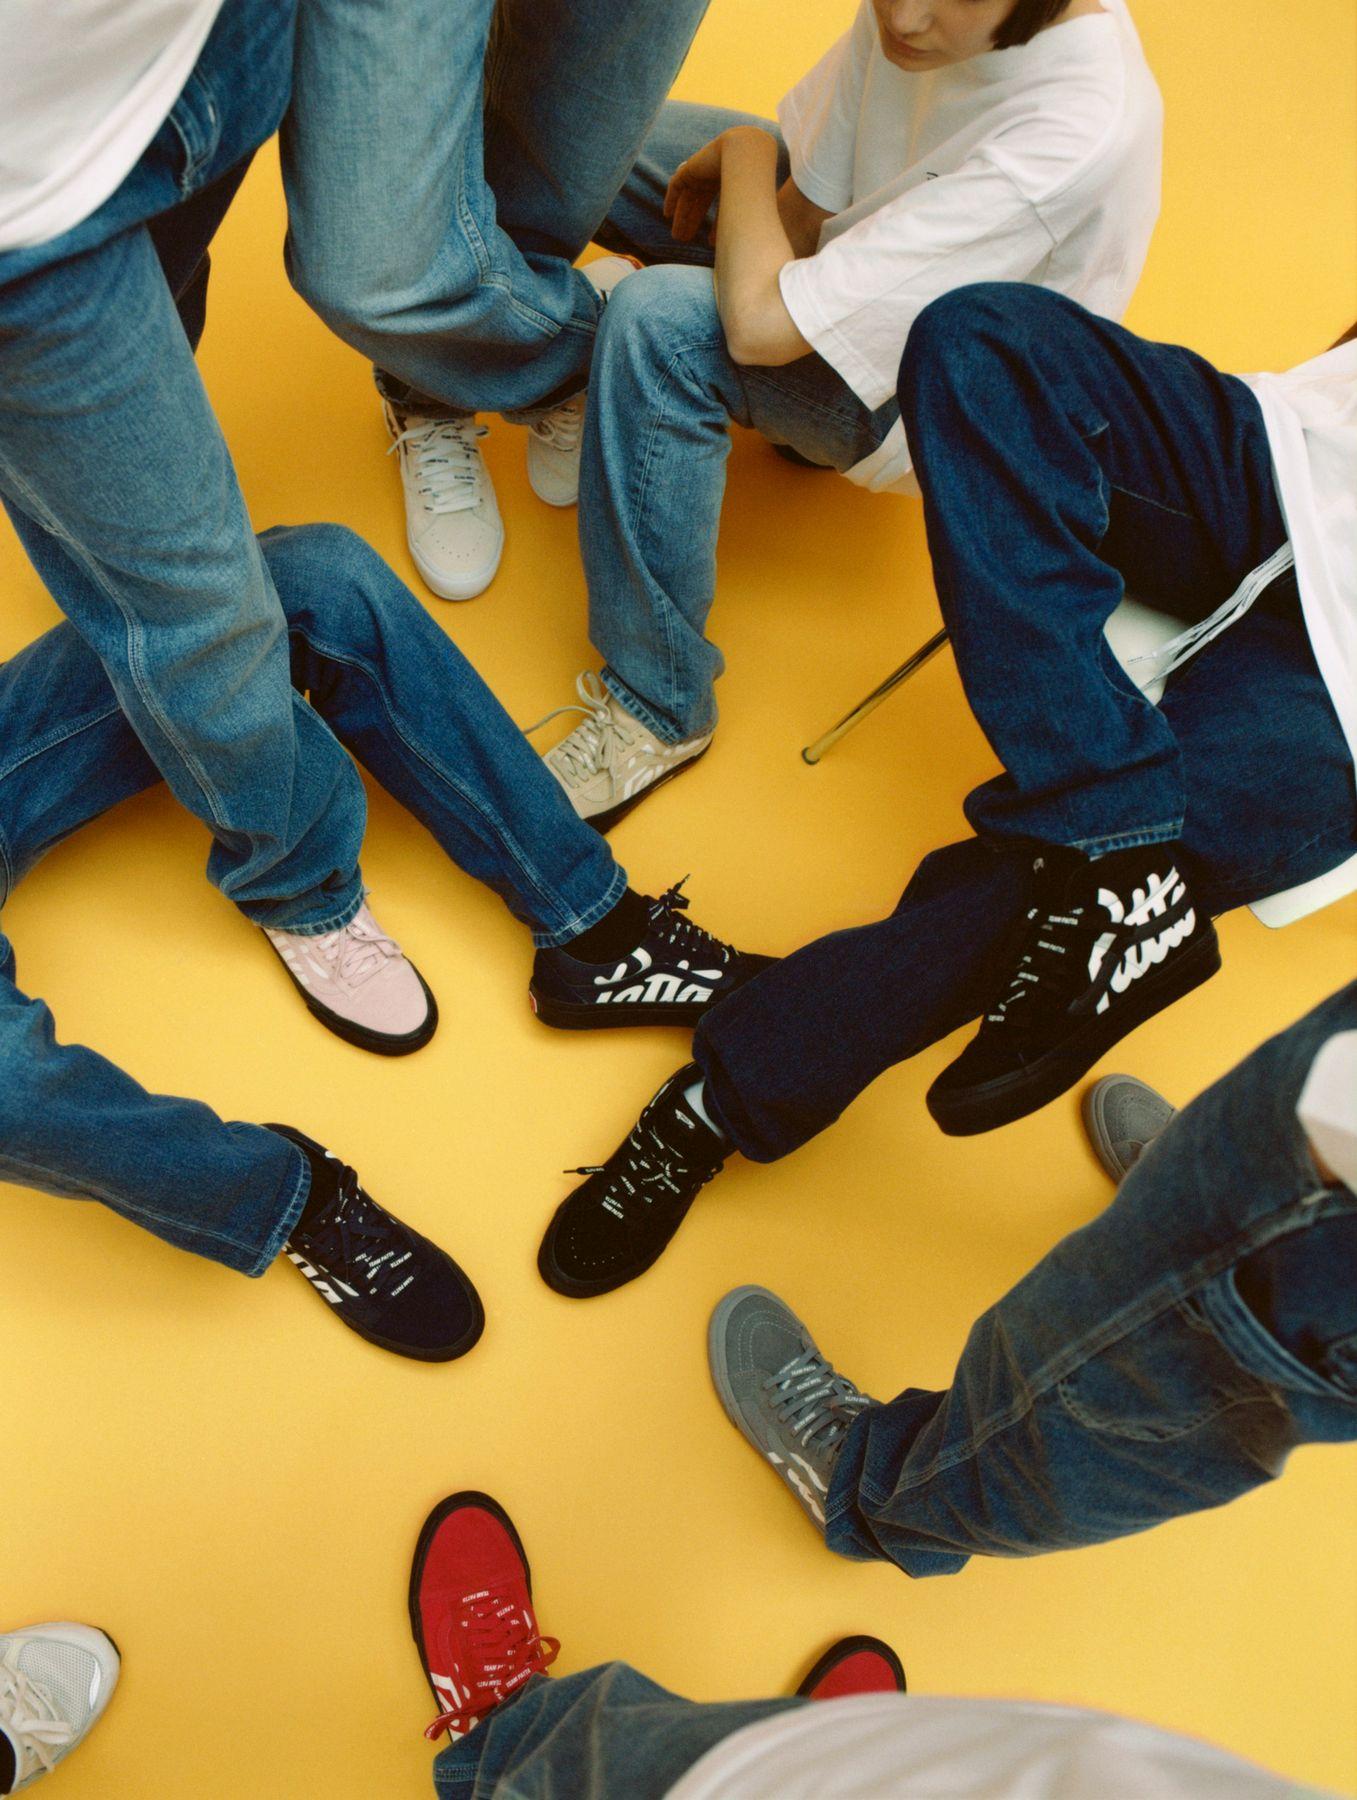 on feet - Vans Vault x Patta - Old Skool LX &Sk8-Hi Reissue LX collection